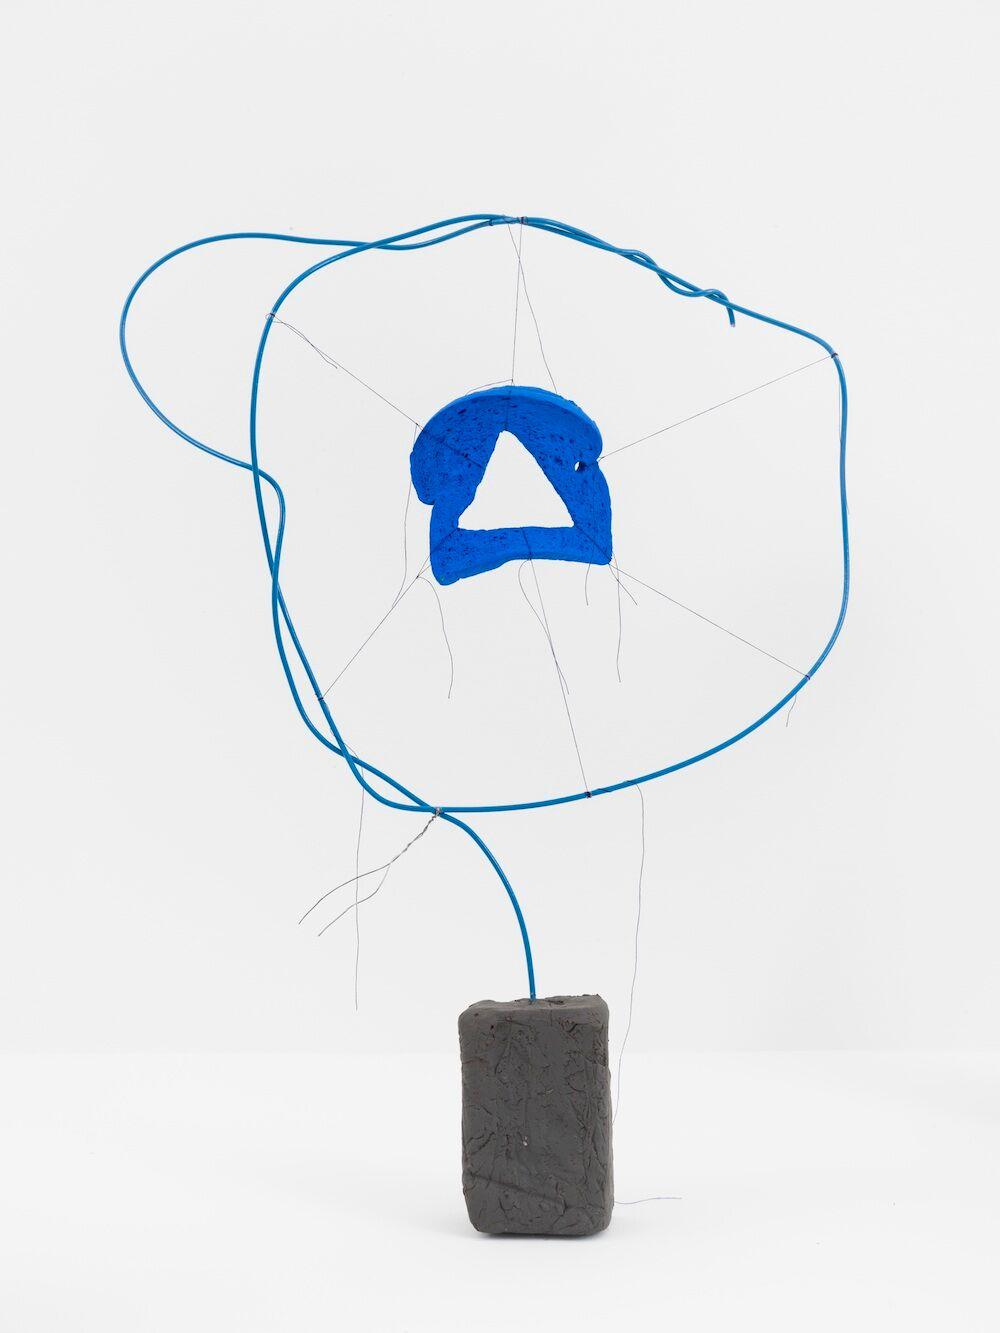 Michelle Segre,  Driftloaf (Blue Triangle) , 2015